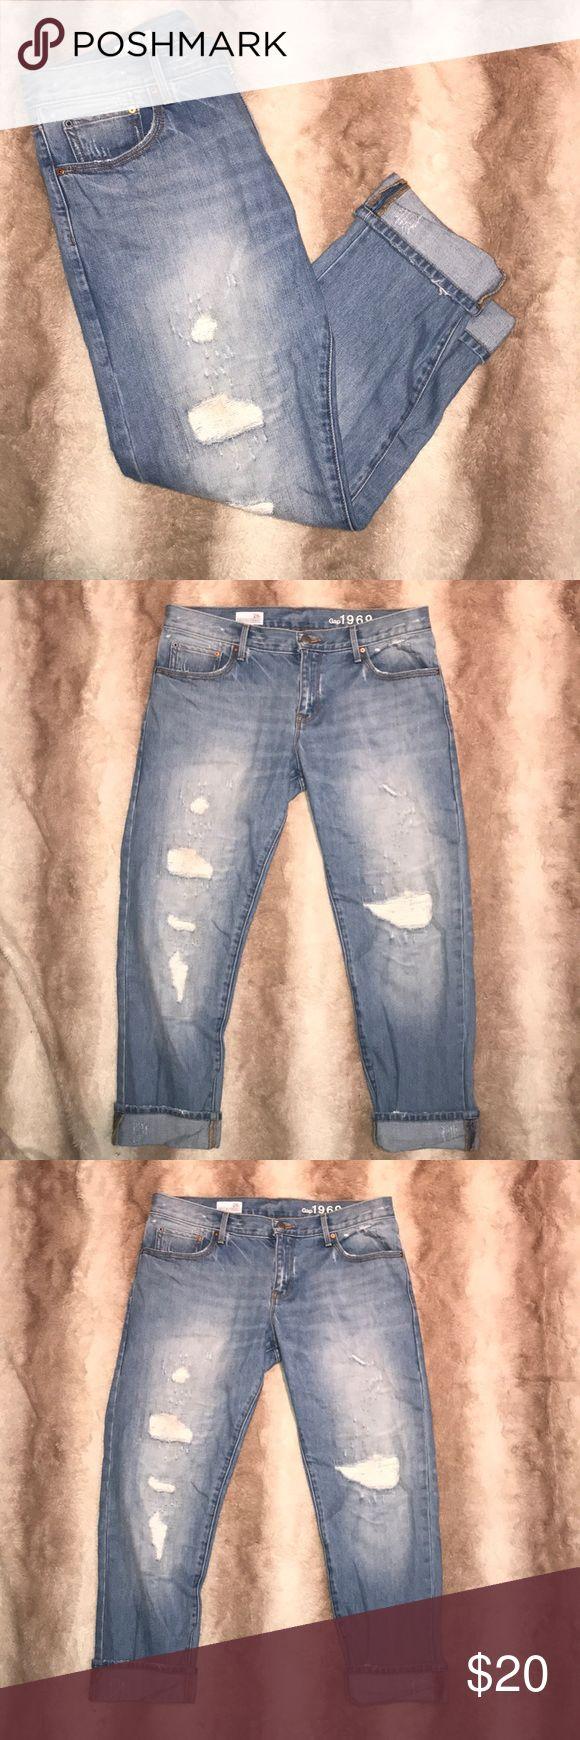 "GAP 1969 Sexy Boyfriend Distressed Denim Jeans Worn only once!!!! Size 28 R light color Denim Distressed Jeans.   17.5"" Waist 36.5"" top to bottom (cuffs unrolled) GAP Jeans Boyfriend"